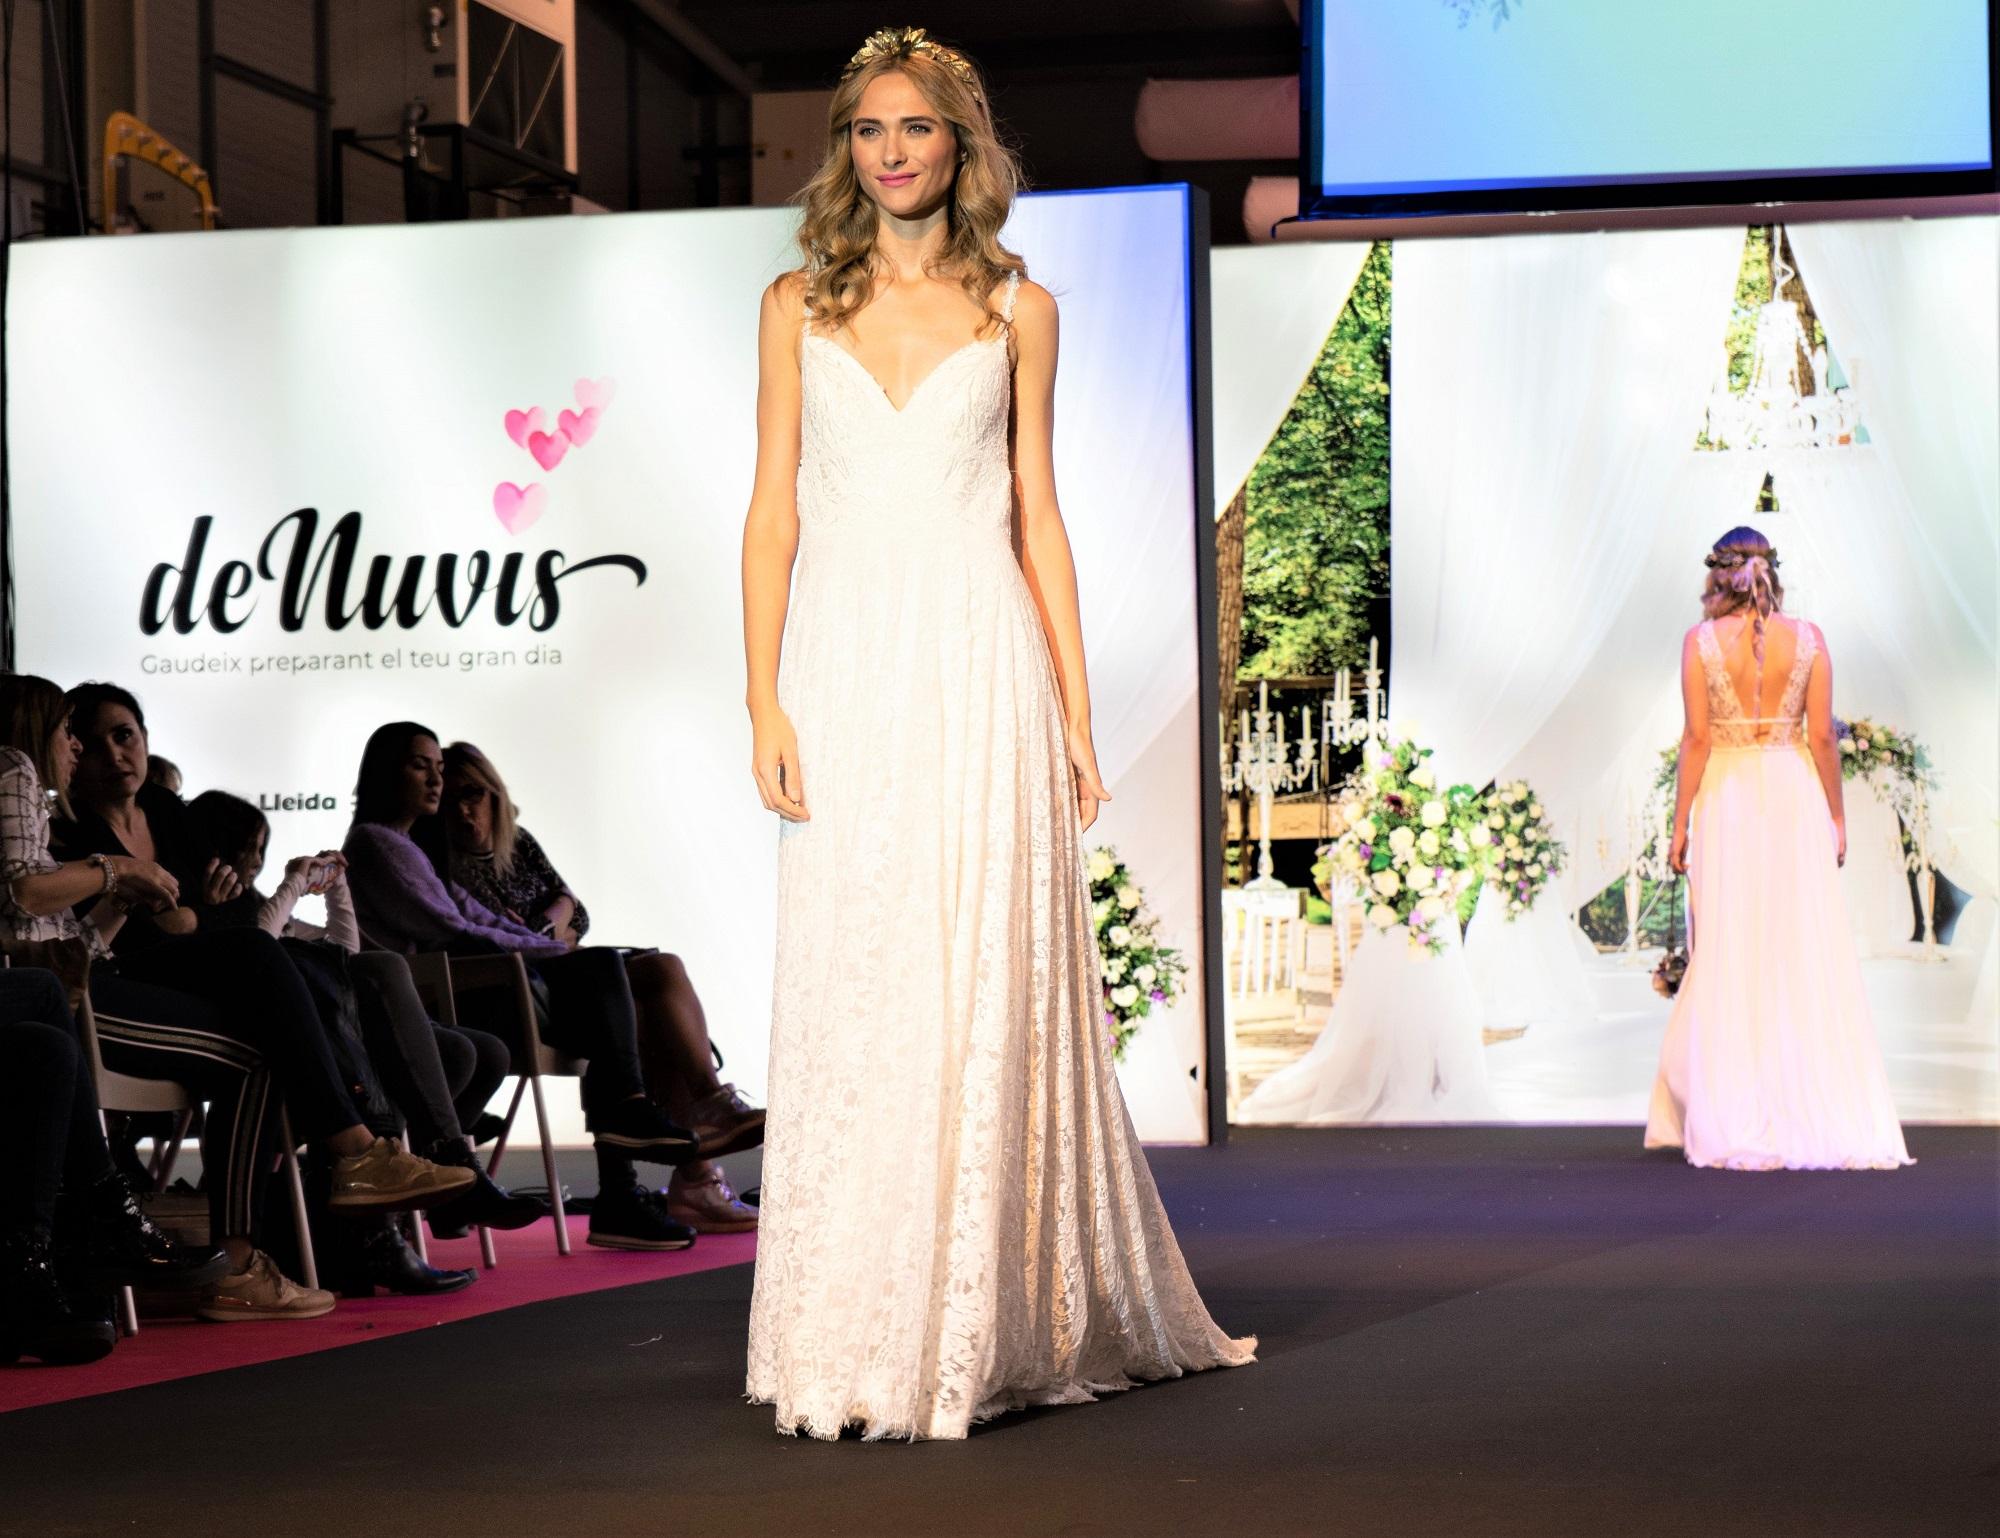 DeNuvis: glamour, negoci i espectacle